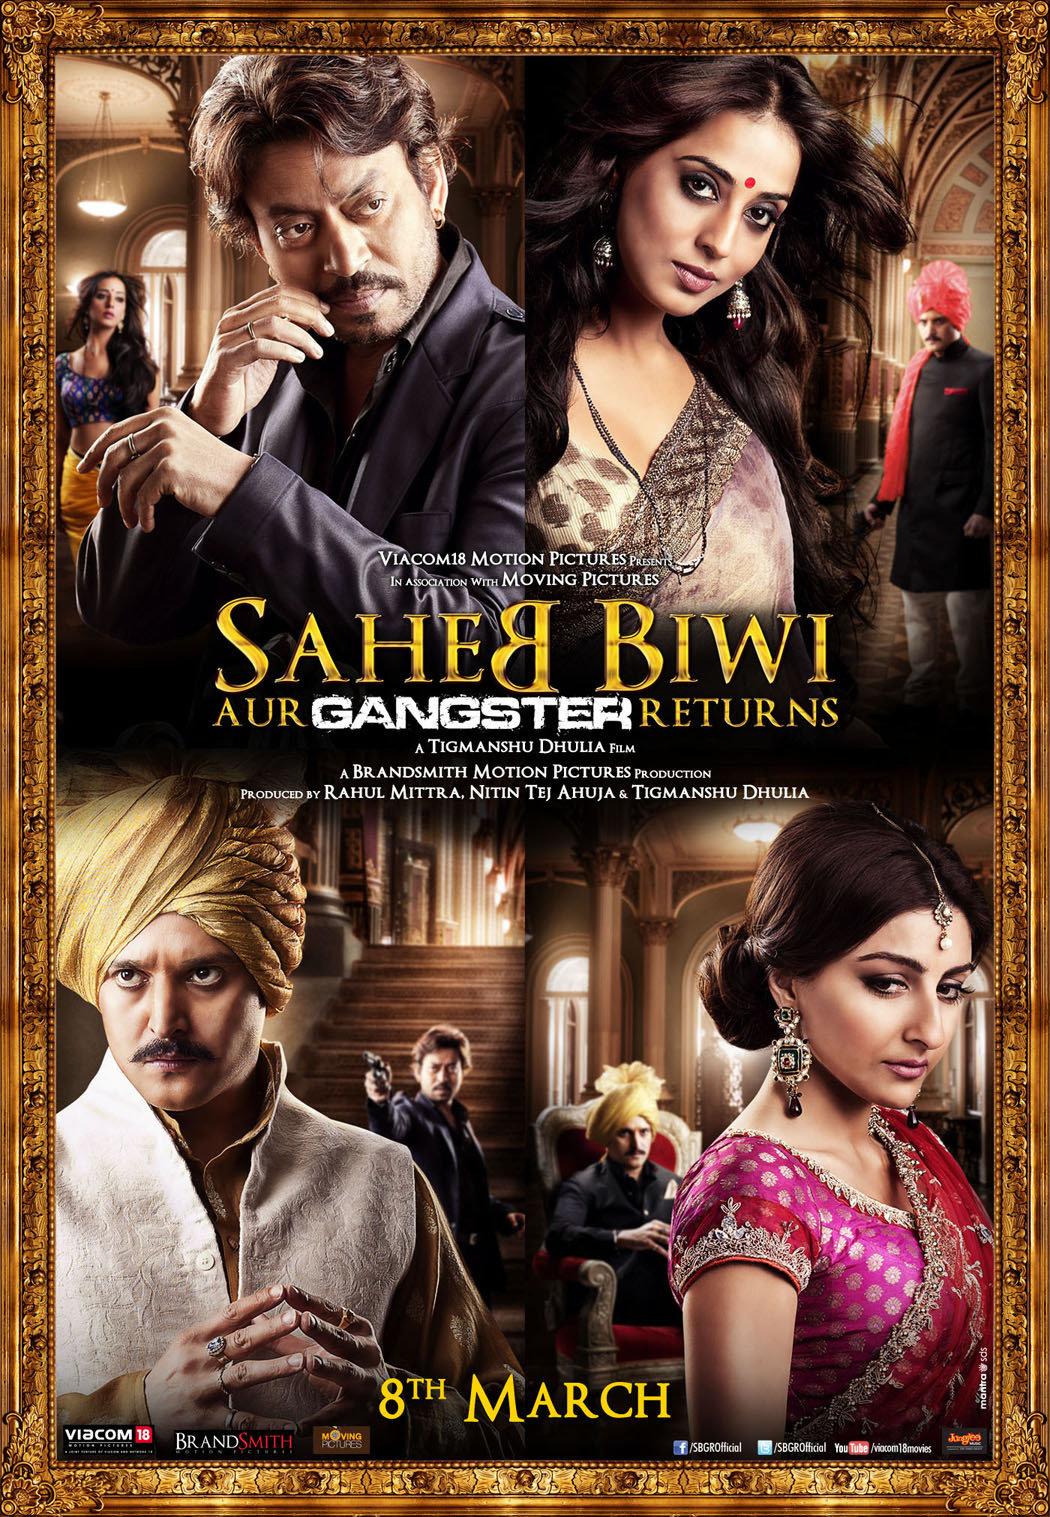 Saheb Biwi Aur Gangster Returns - Movie Poster #1 (Original)